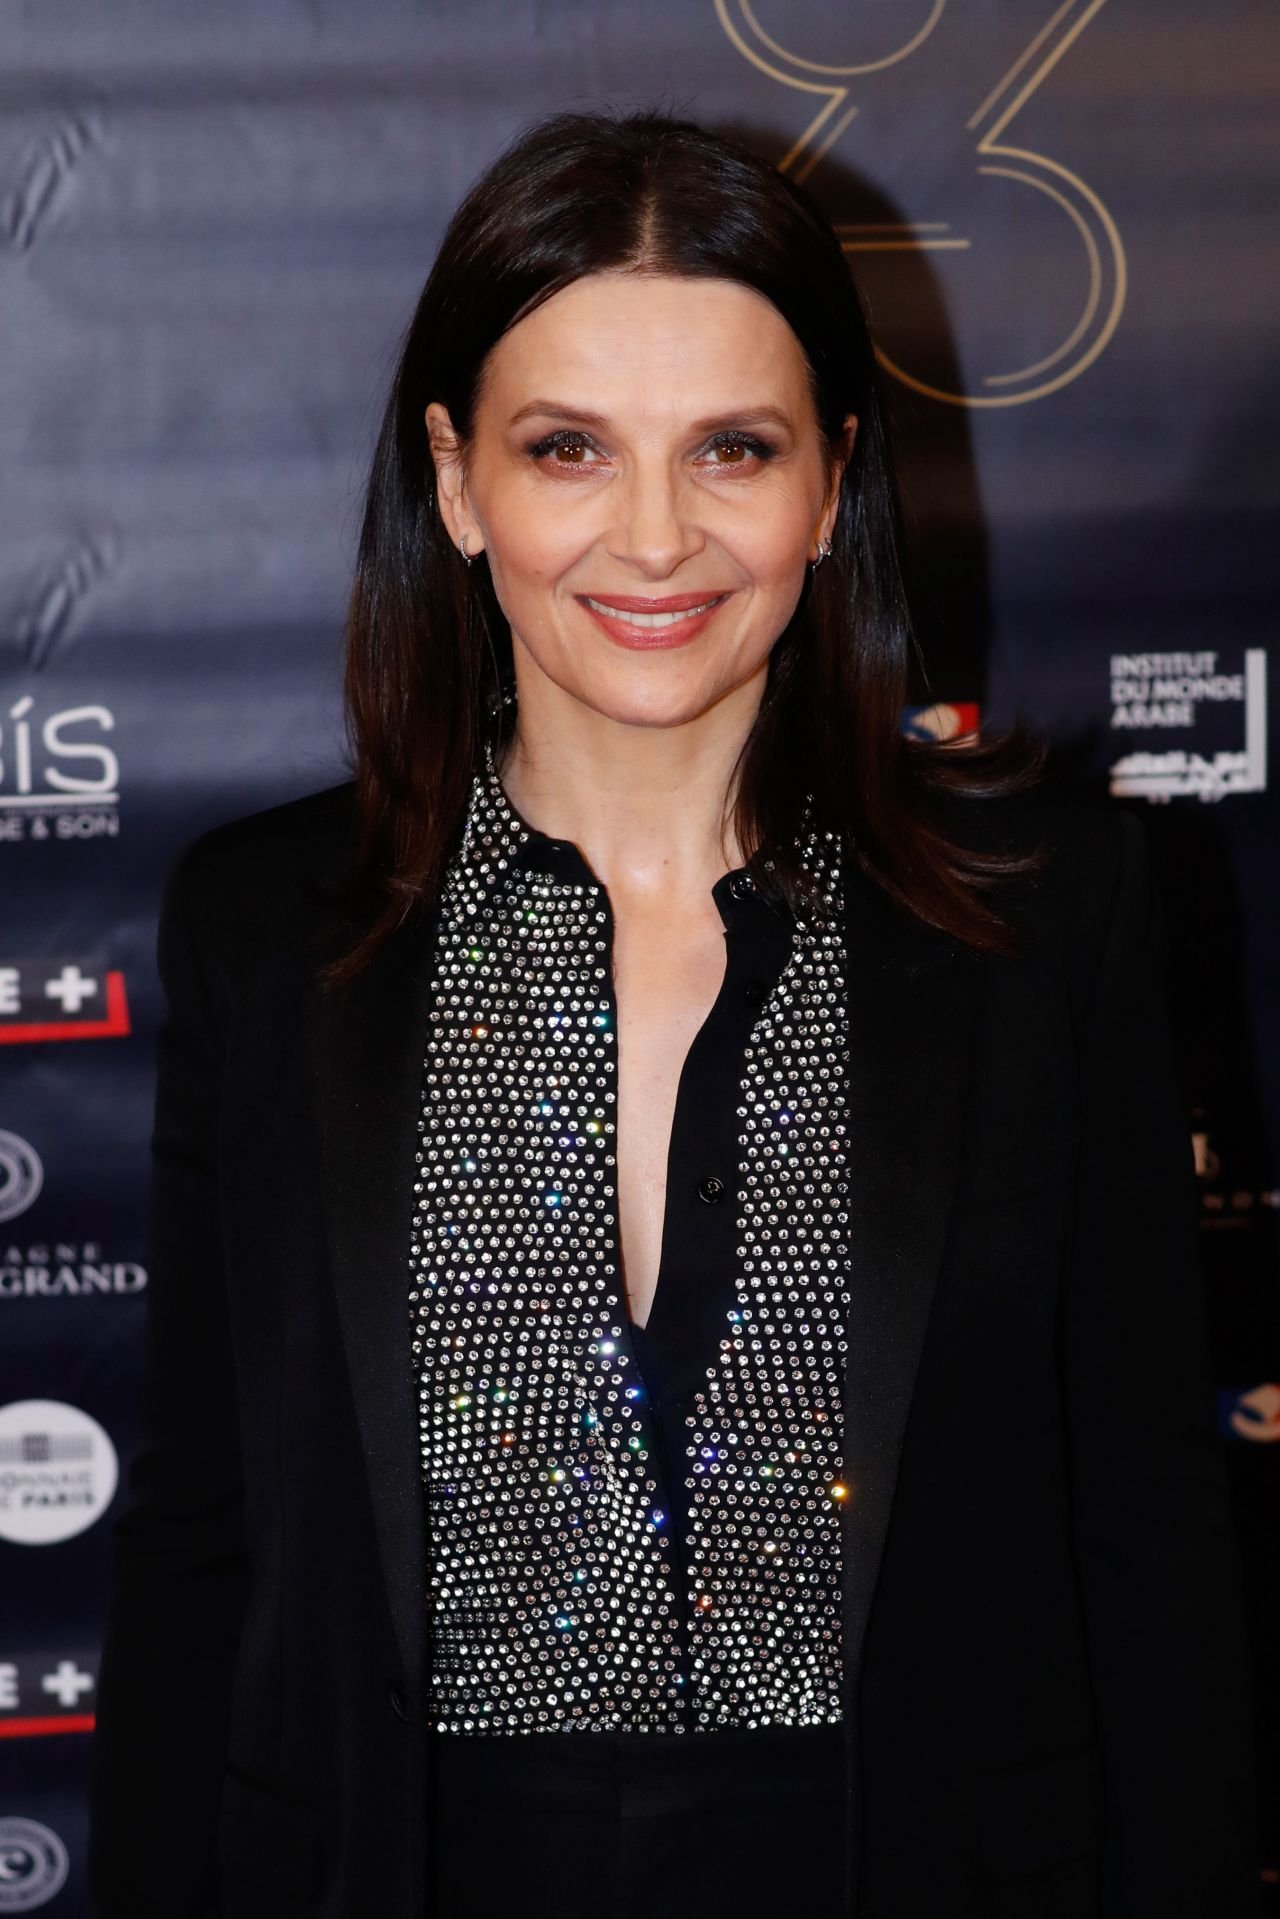 http://celebmafia.com/wp-content/uploads/2018/02/juliette-binoche-lumieres-awards-ceremony-in-paris-5.jpg